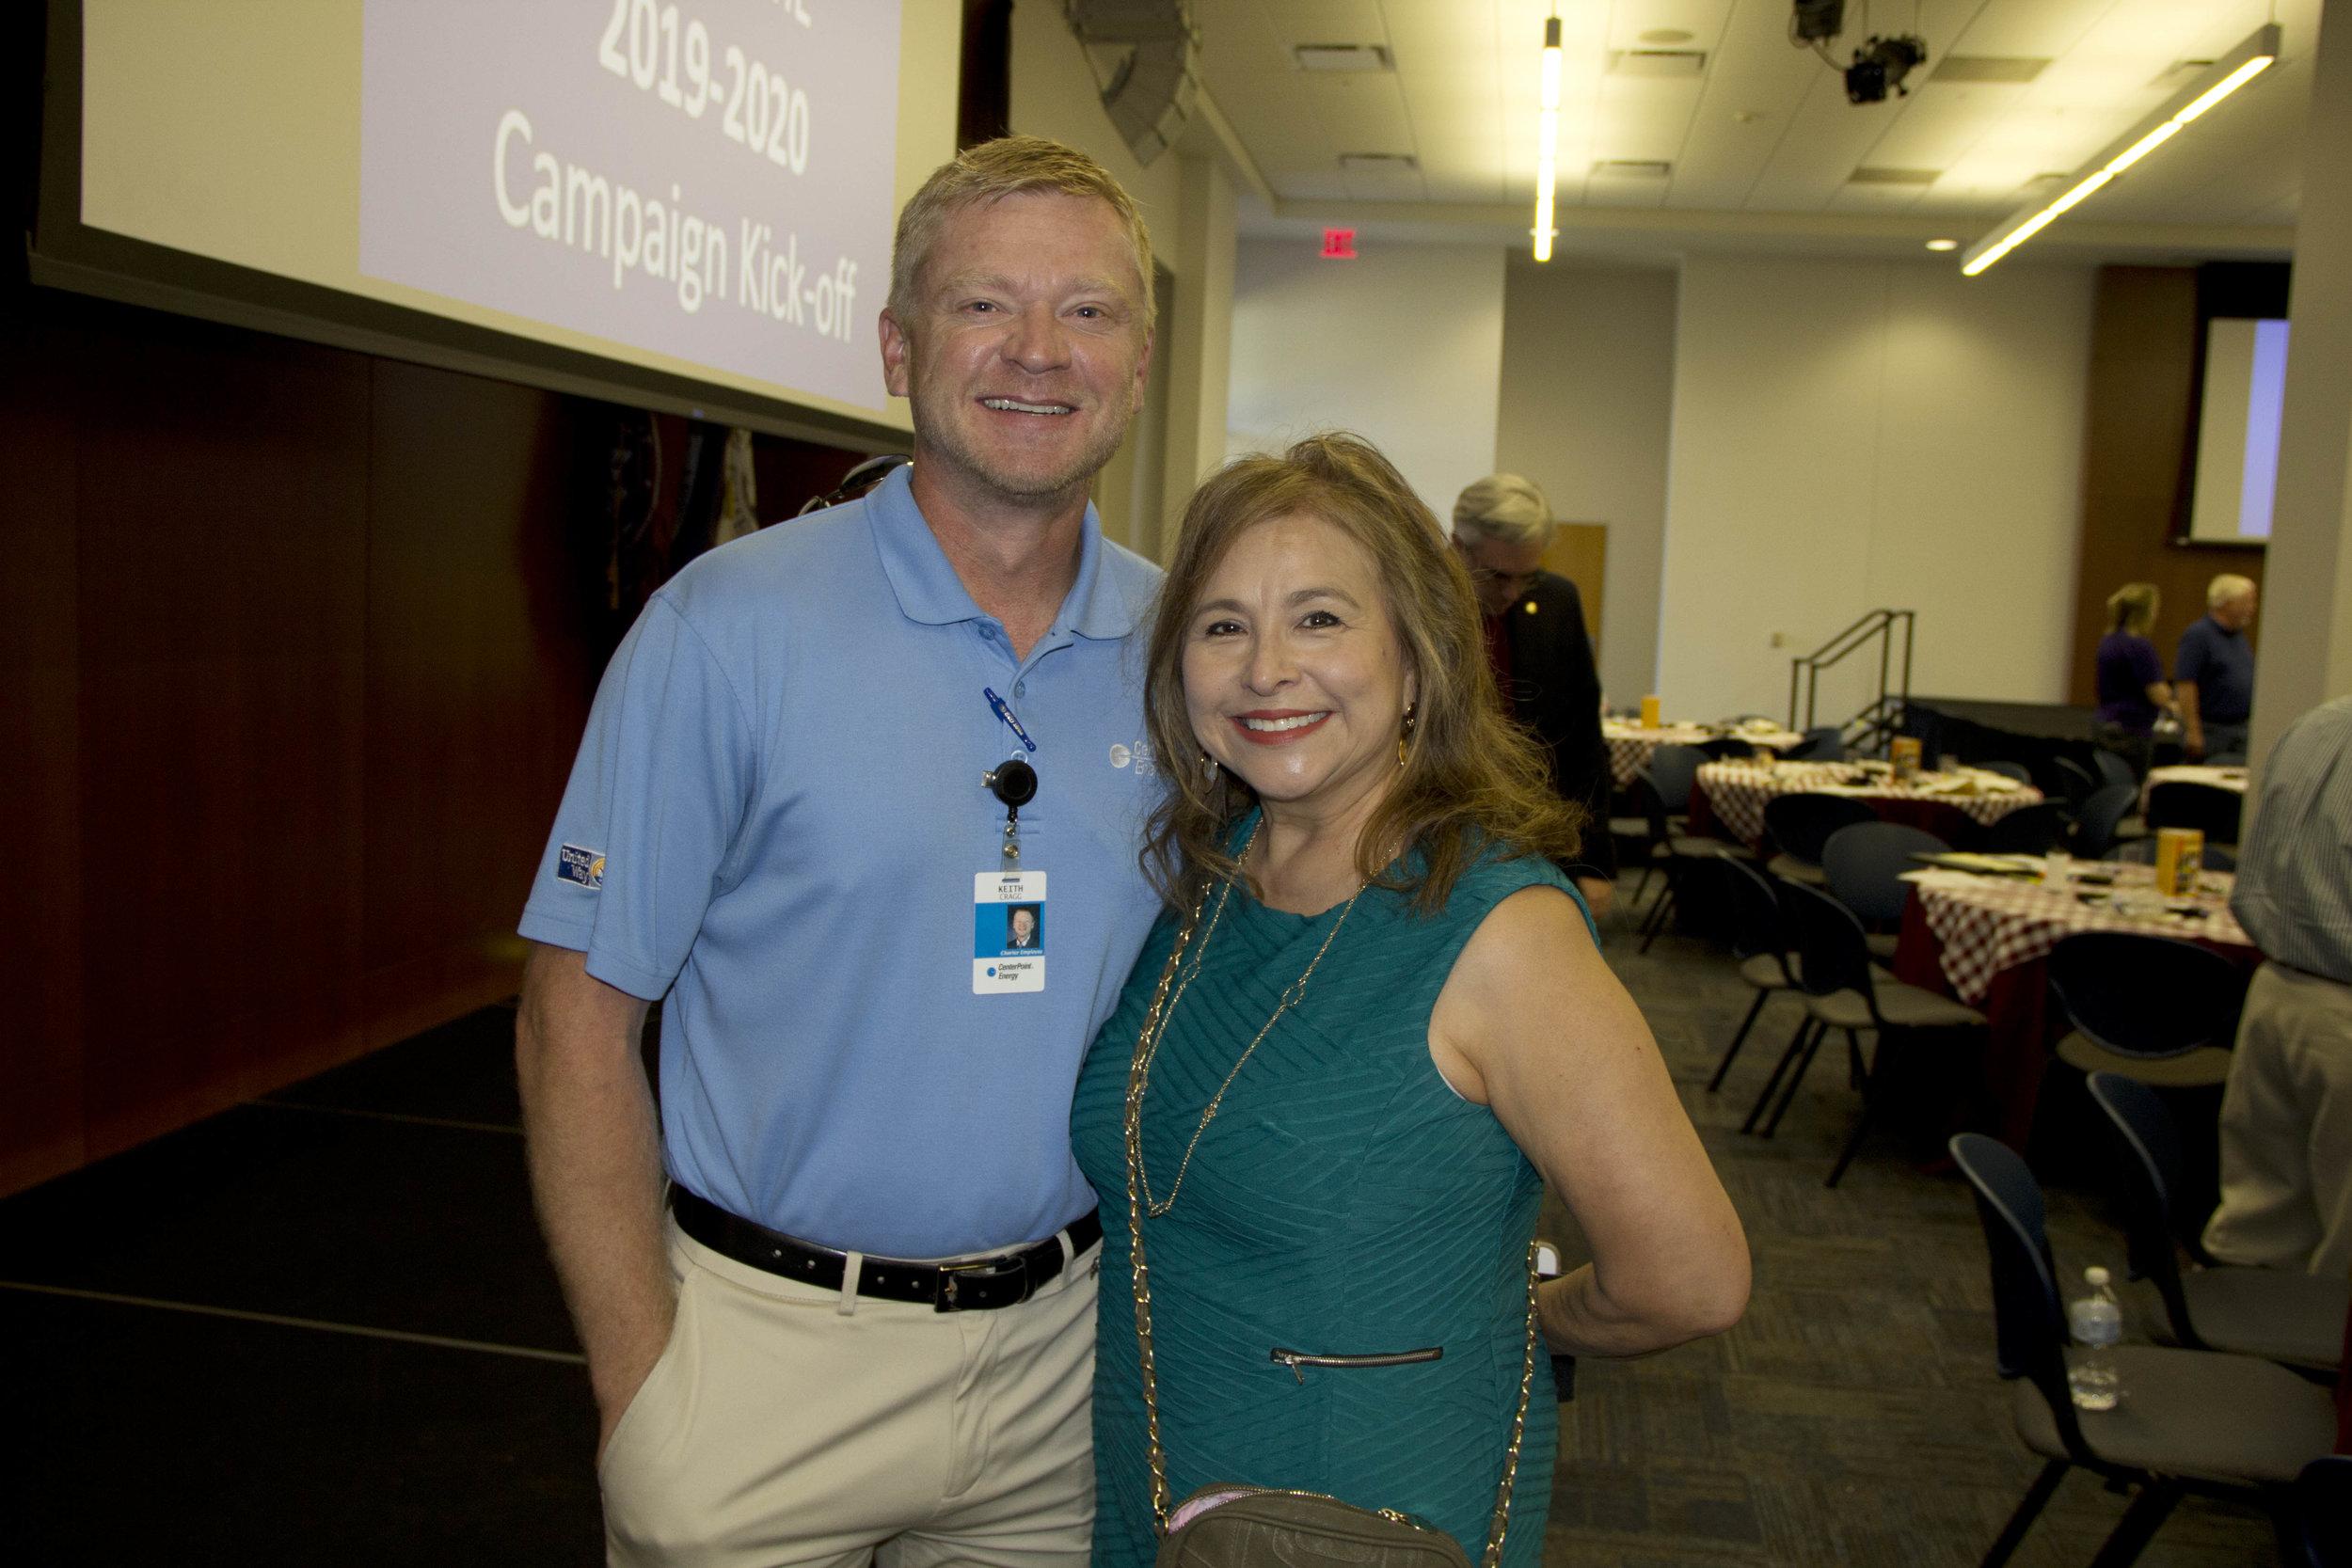 Keith Cragg and Mary Wormington